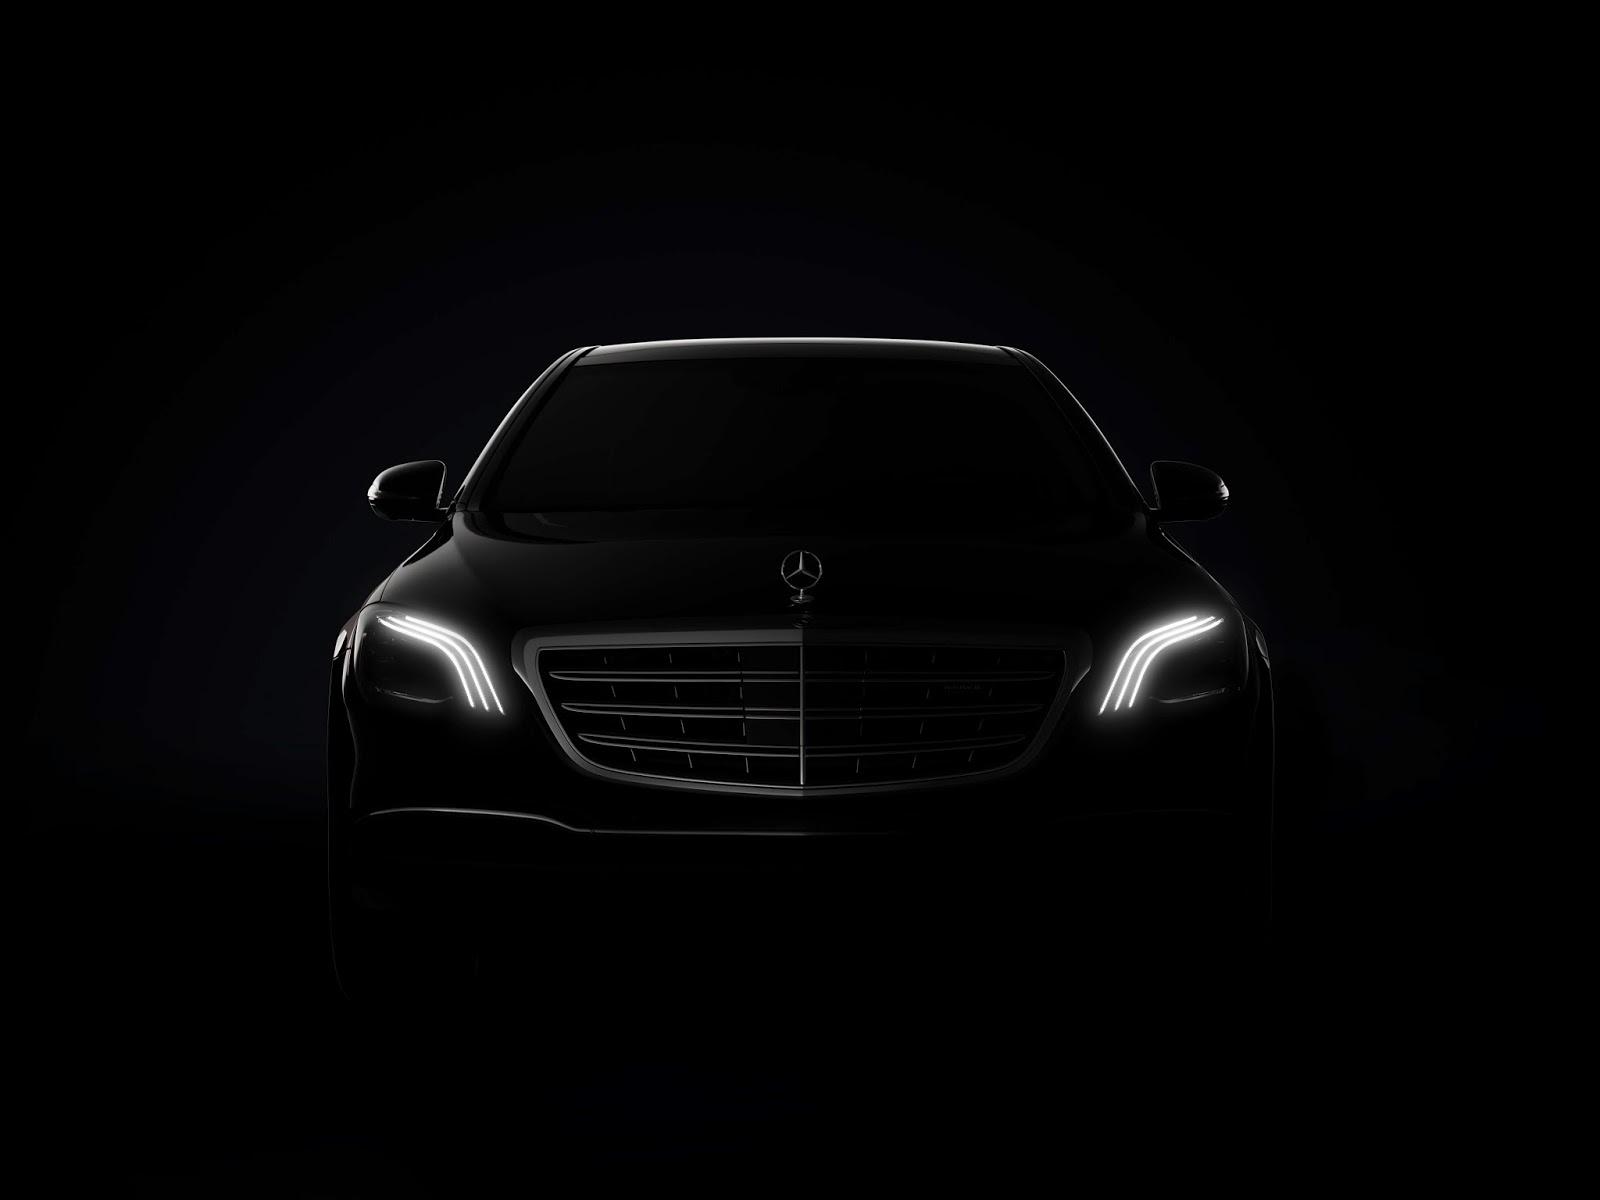 Konsumsi Bbm All New Kijang Innova Diesel Perbedaan Grand Avanza Veloz 1.3 Dan 1.5 First Impression Mercedes S 450 L Kemewahan Tradisional